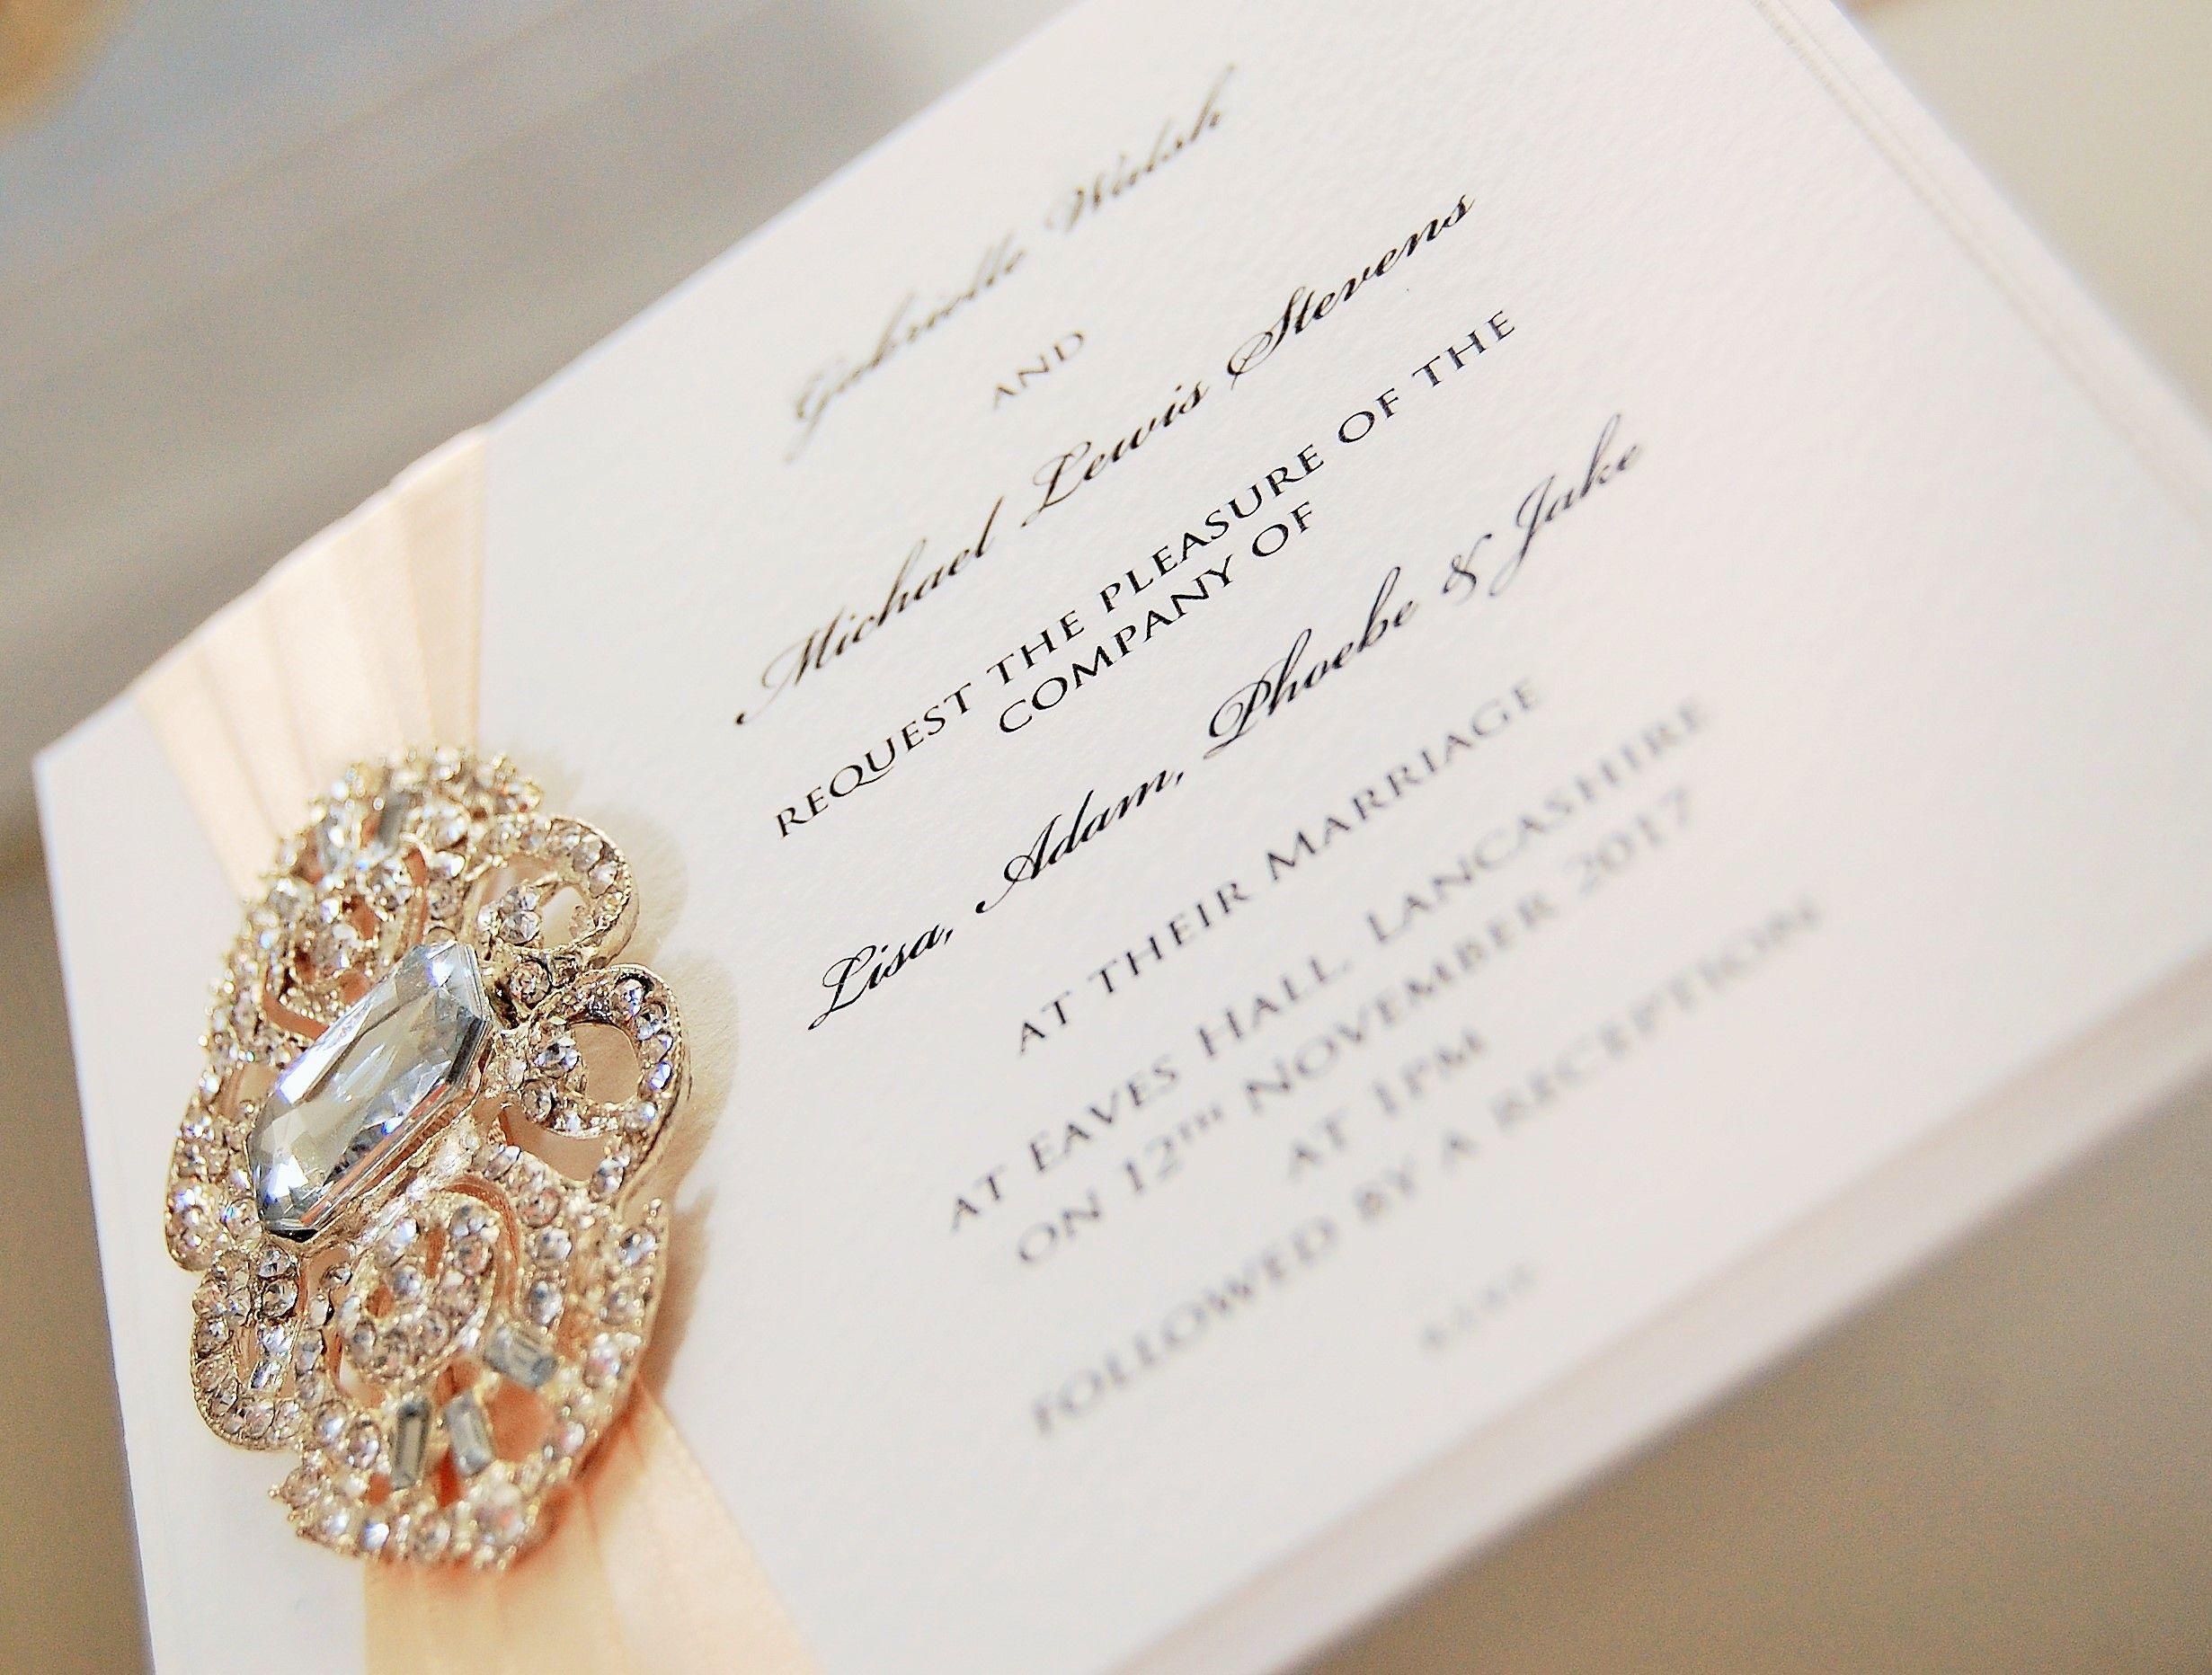 HipTwist Stationery BossaNova Collection - Luxury Wedding ...